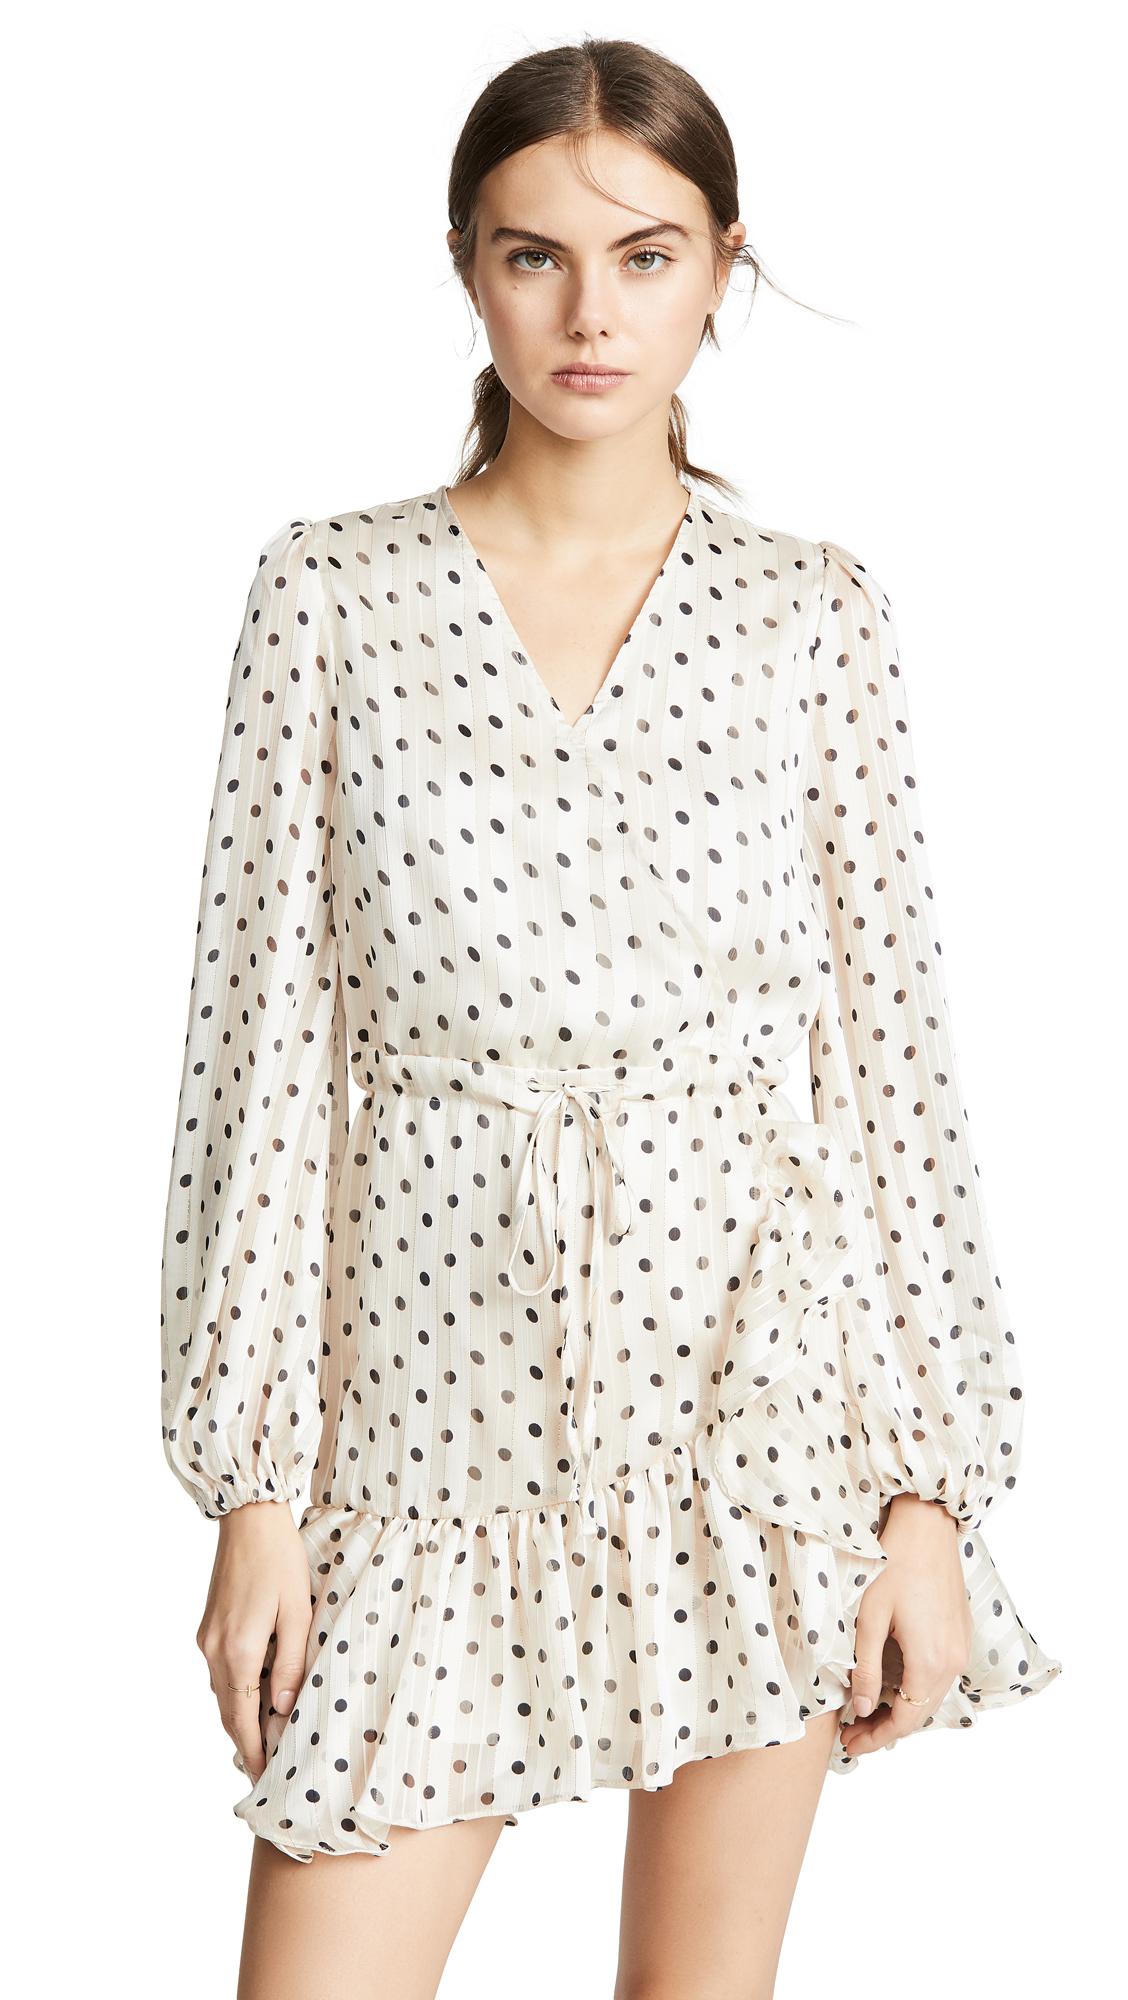 STYLEKEEPERS If You Dare Dress in Black Polka Dot